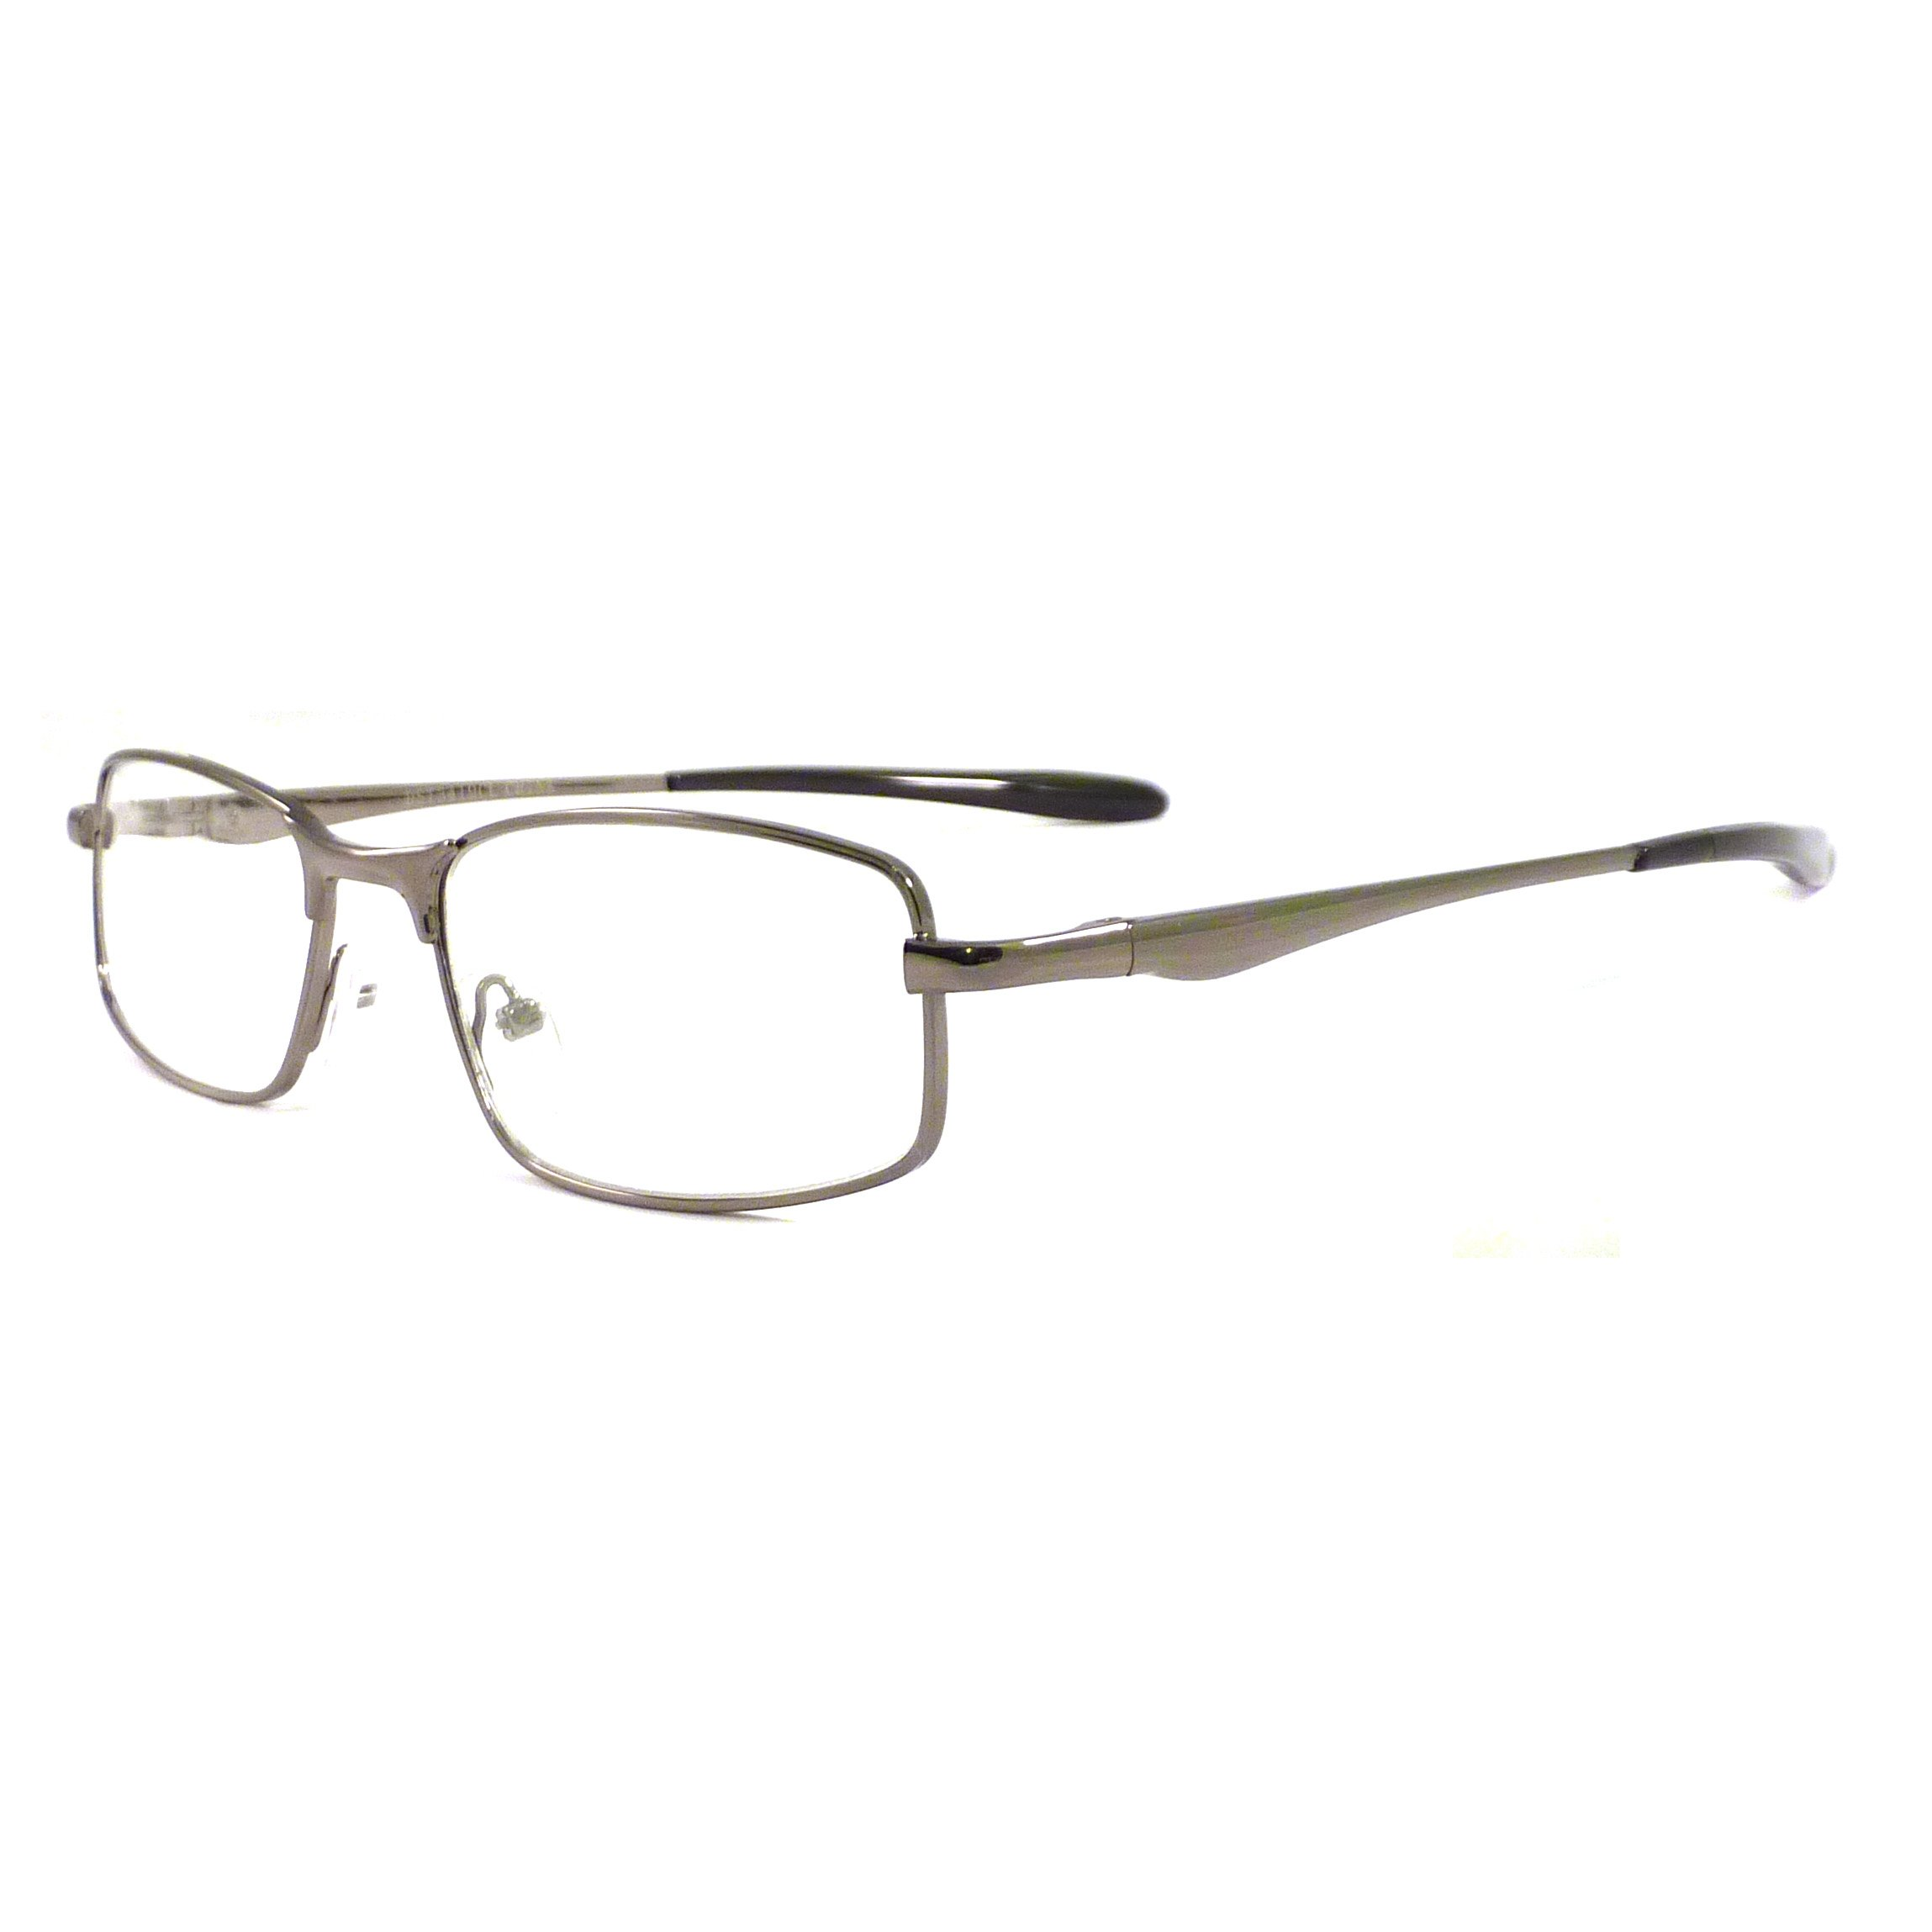 METAL Optical Eyeglass Frame Rx-able Clear Lens Eye Glasses BRONZE/BLACK